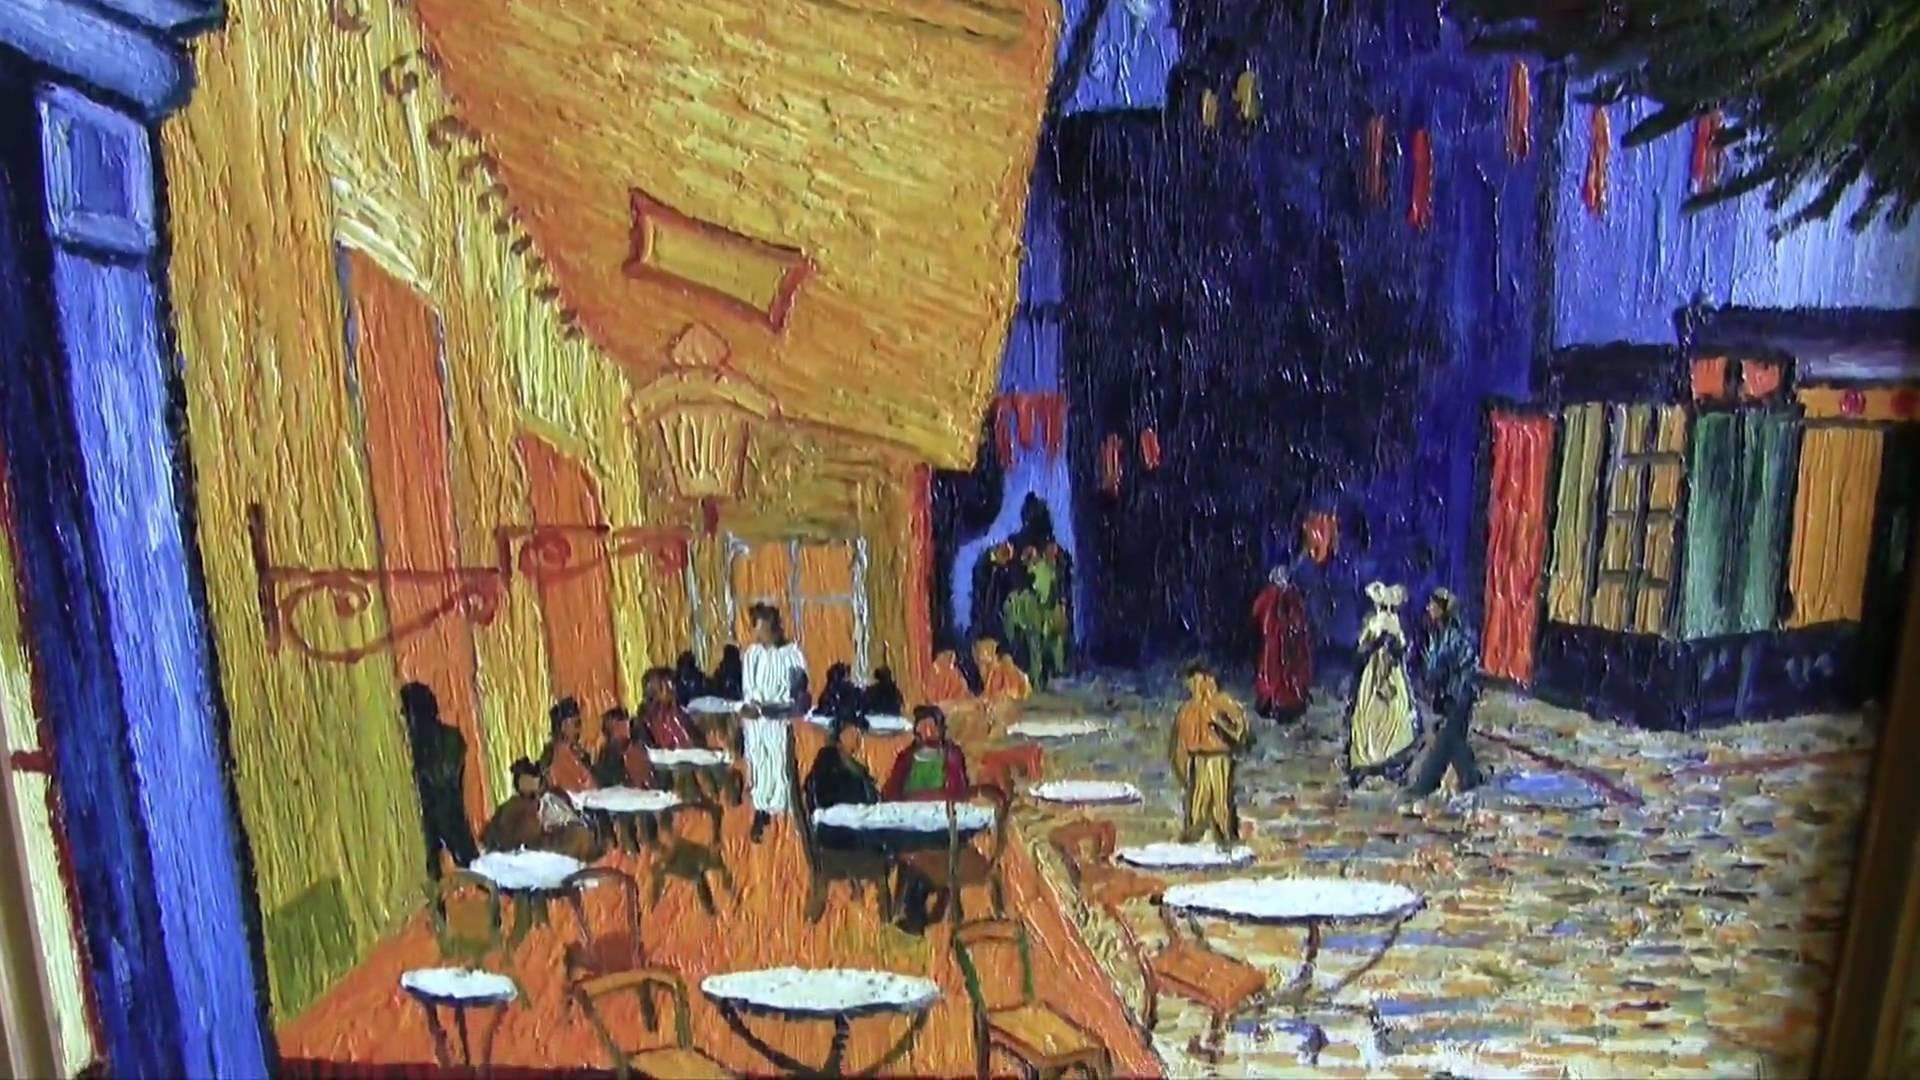 Van Gogh Starry Night Iphone Wallpaper Vincent Van Gogh Wallpaper 63 Images